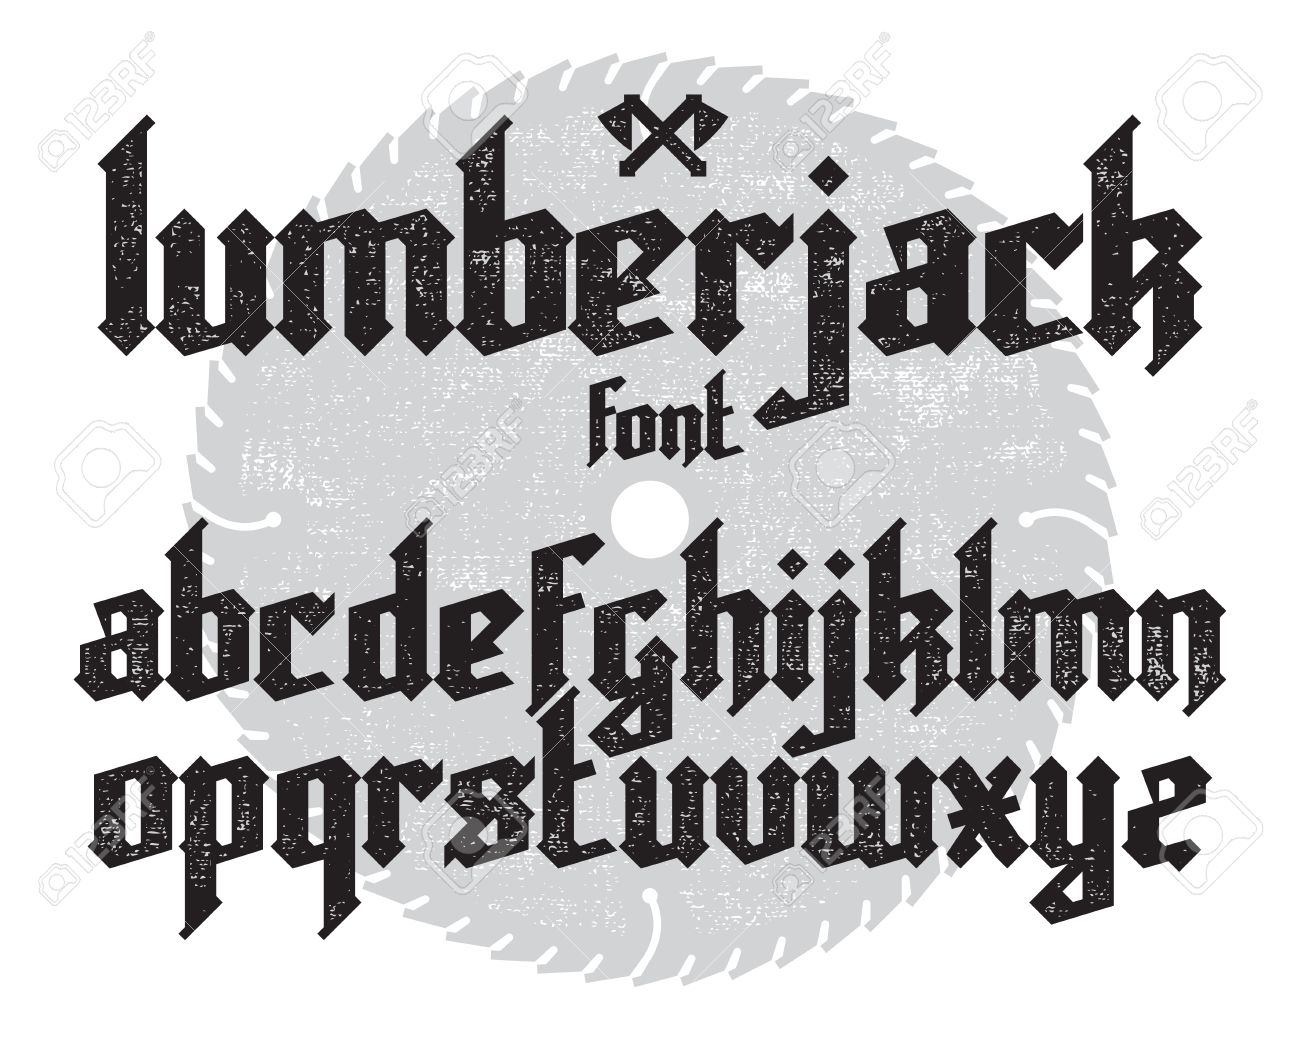 Lumberjack New Modern Custom Gothic Alphabet Font Black Set On Saw And Canvas Background